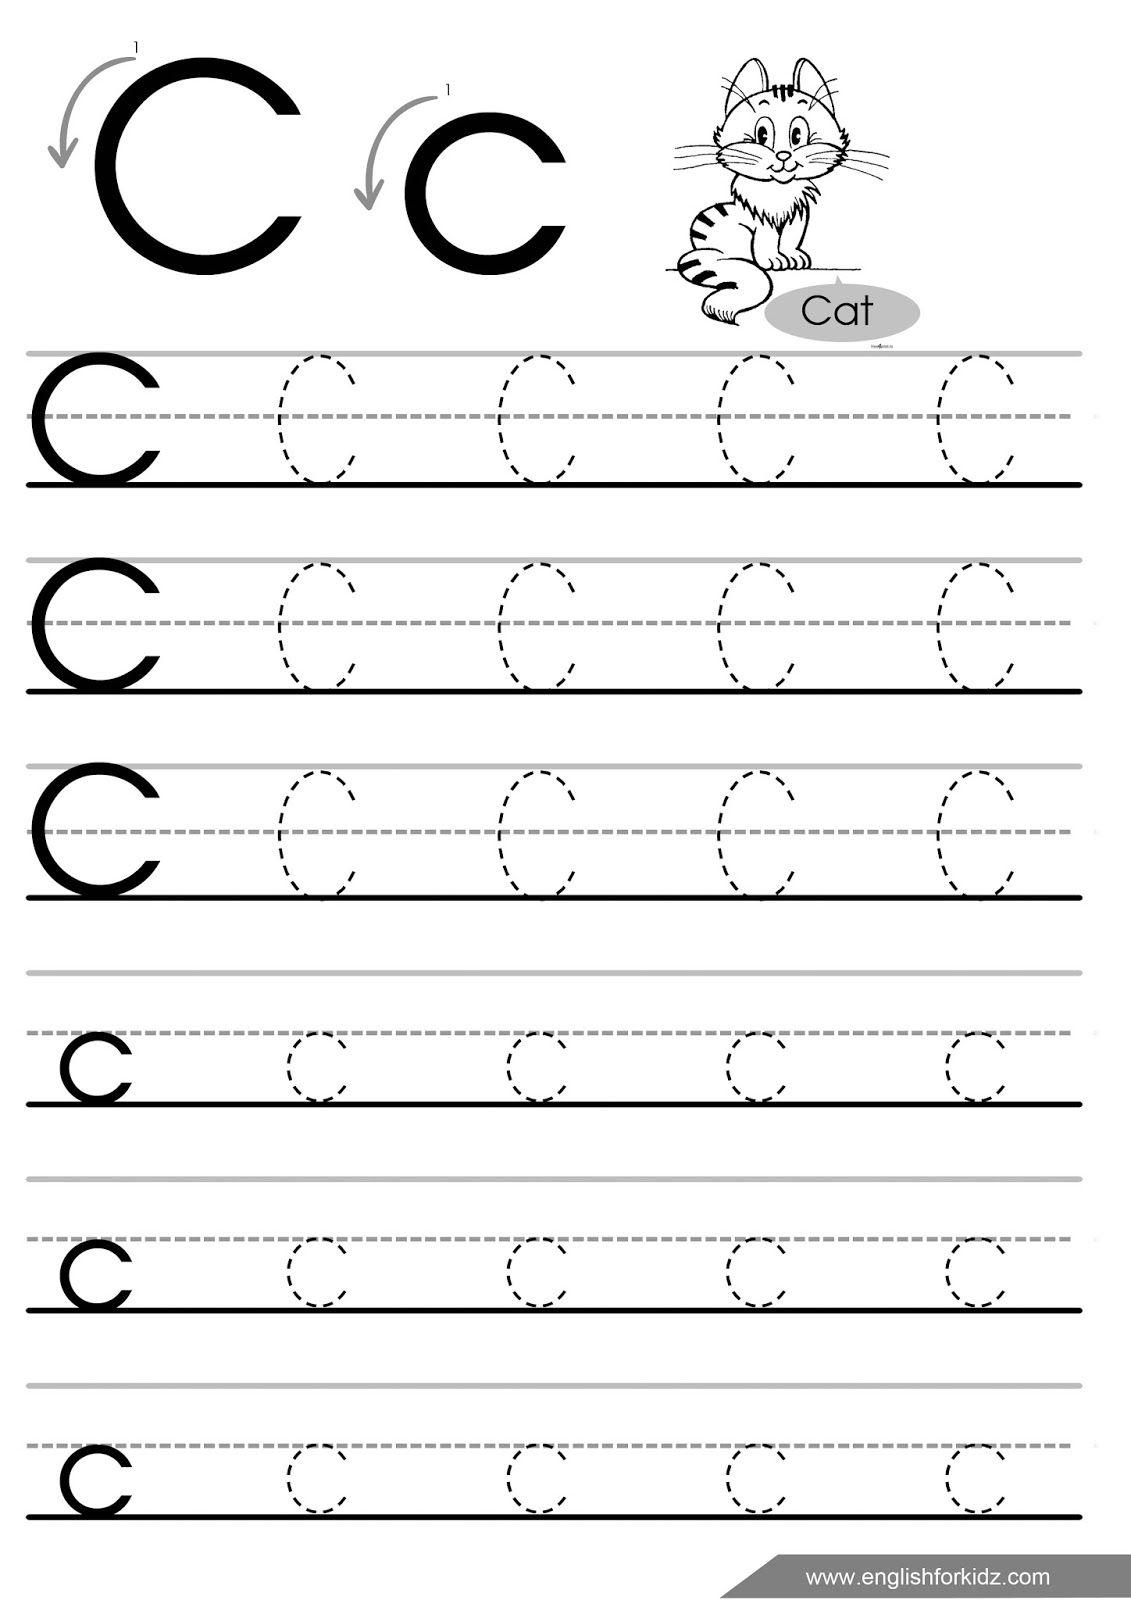 Letter C Tracing Worksheet For Esl Teachers   Letter Tracing pertaining to C Letter Tracing Worksheet